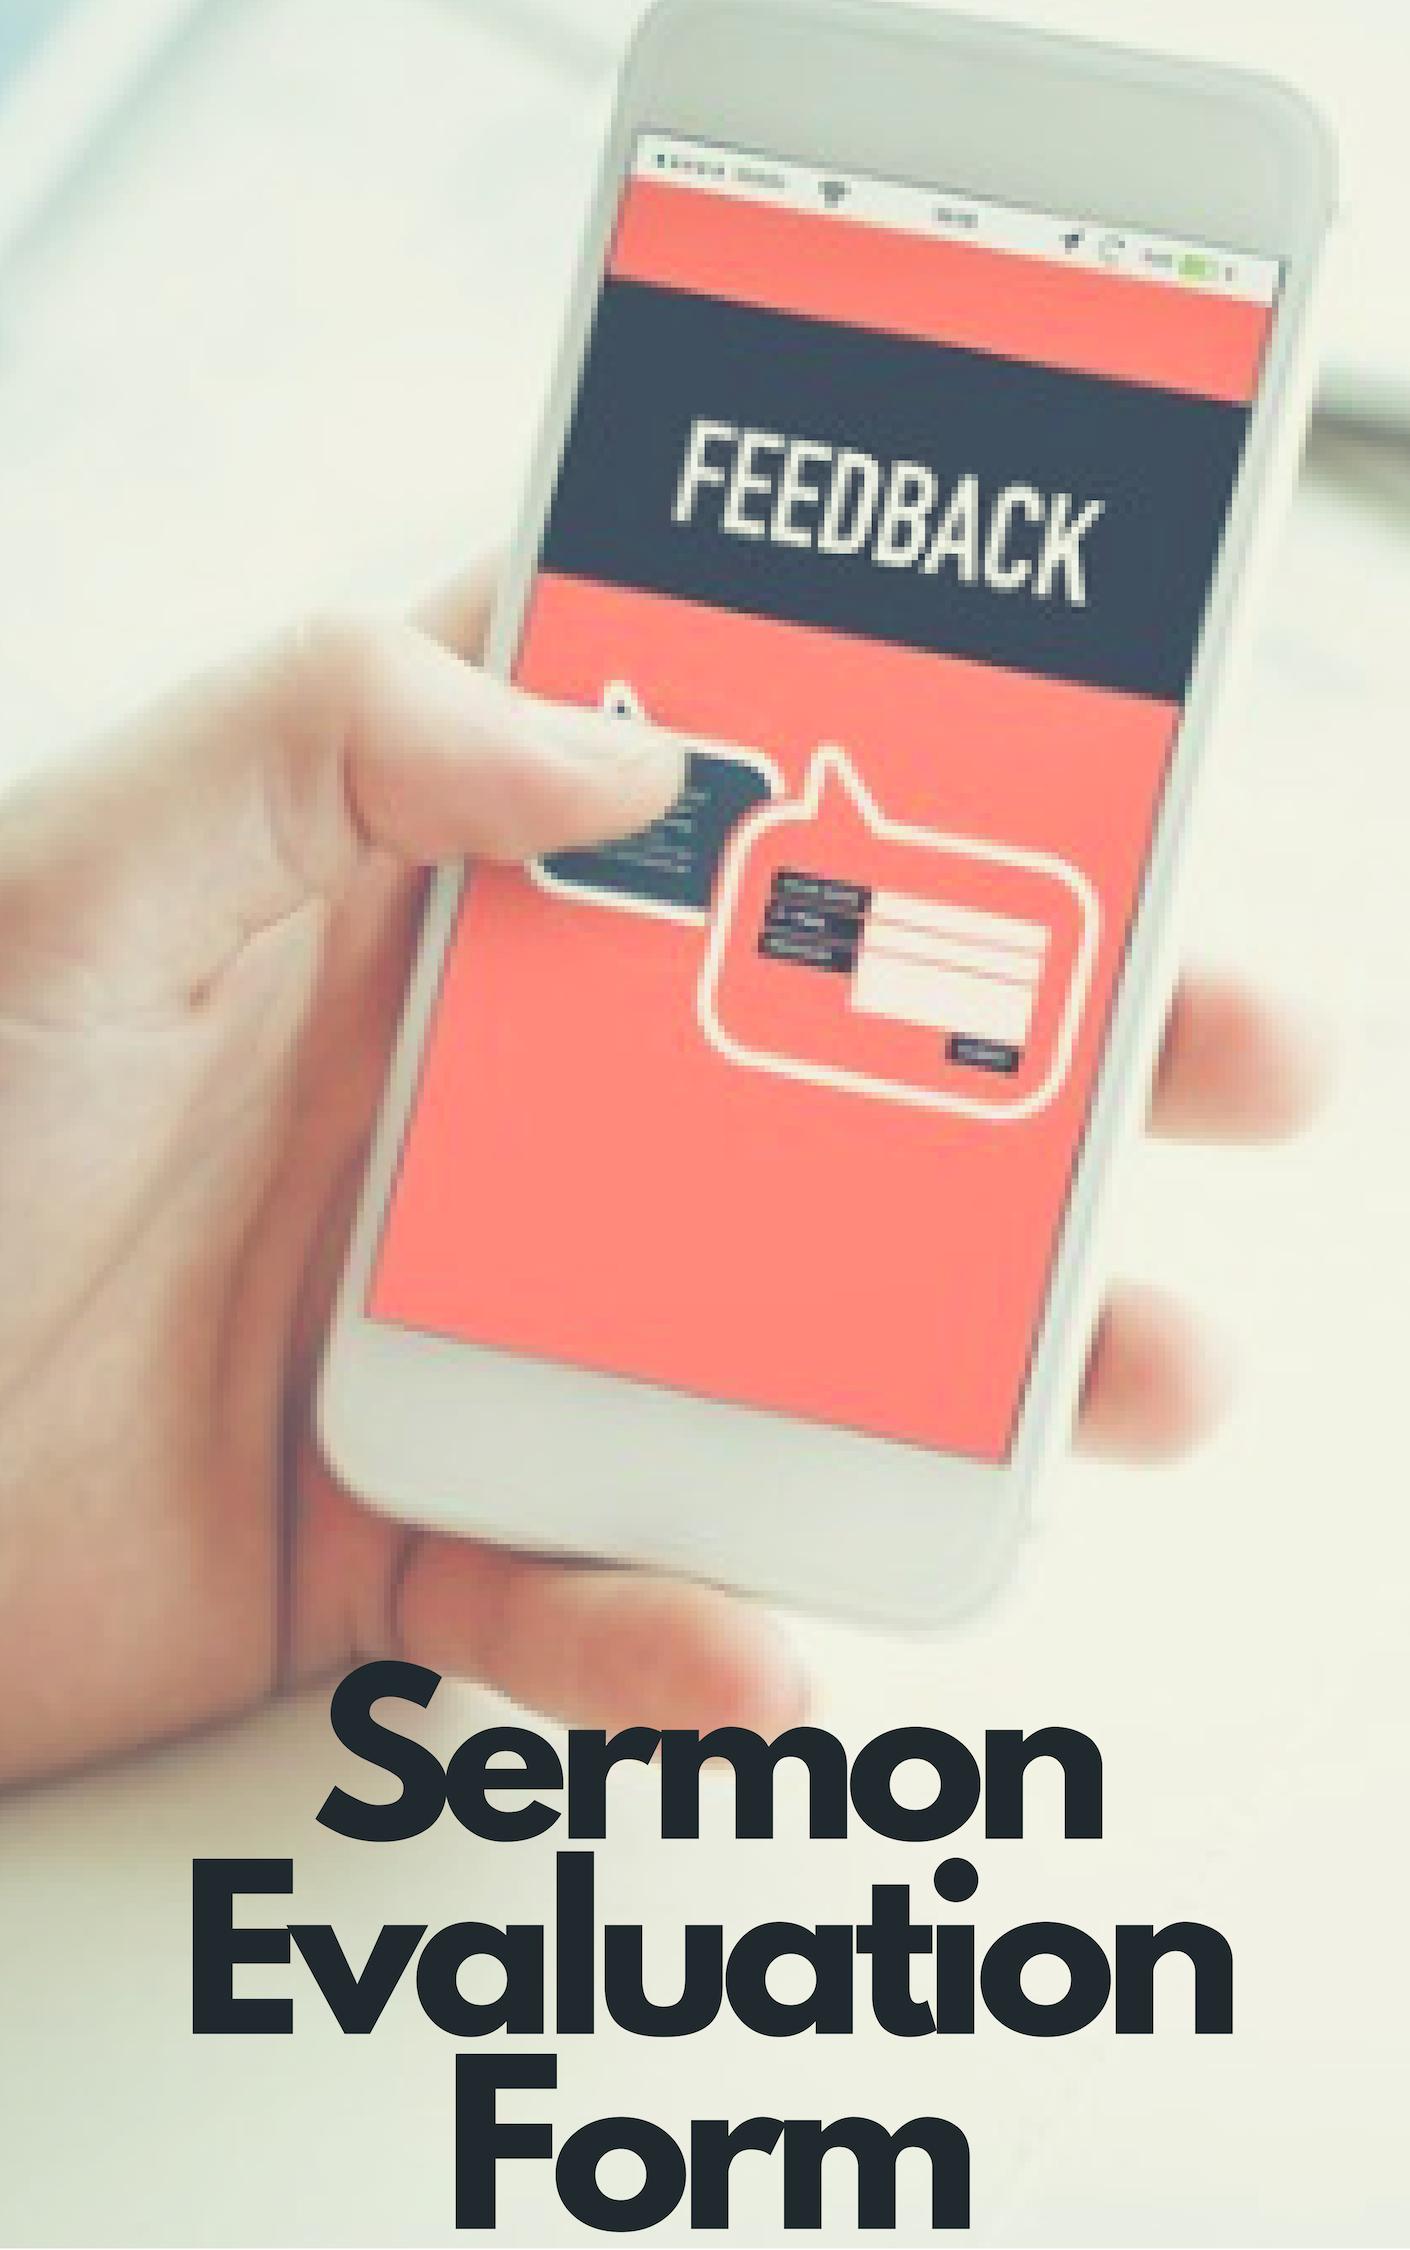 sermon evaluation form keller  Free Sermon Evaluation Form [Instant Download]